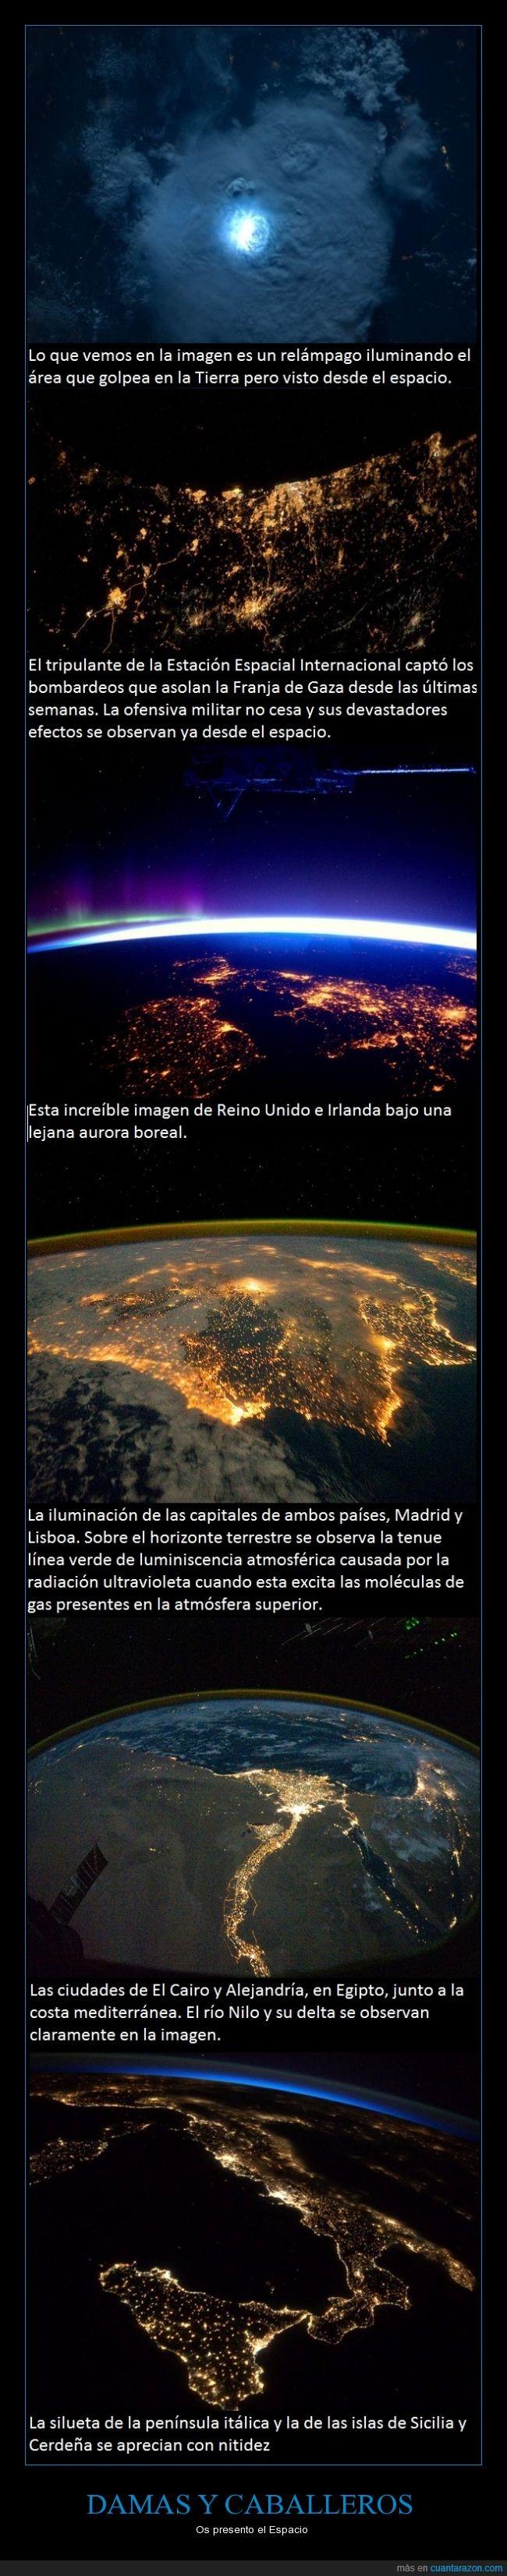 Atmósfera,Aurora,Espacio,Gaza,Irlanda,Madrid,Nilo,Reino Unido,Relámpago